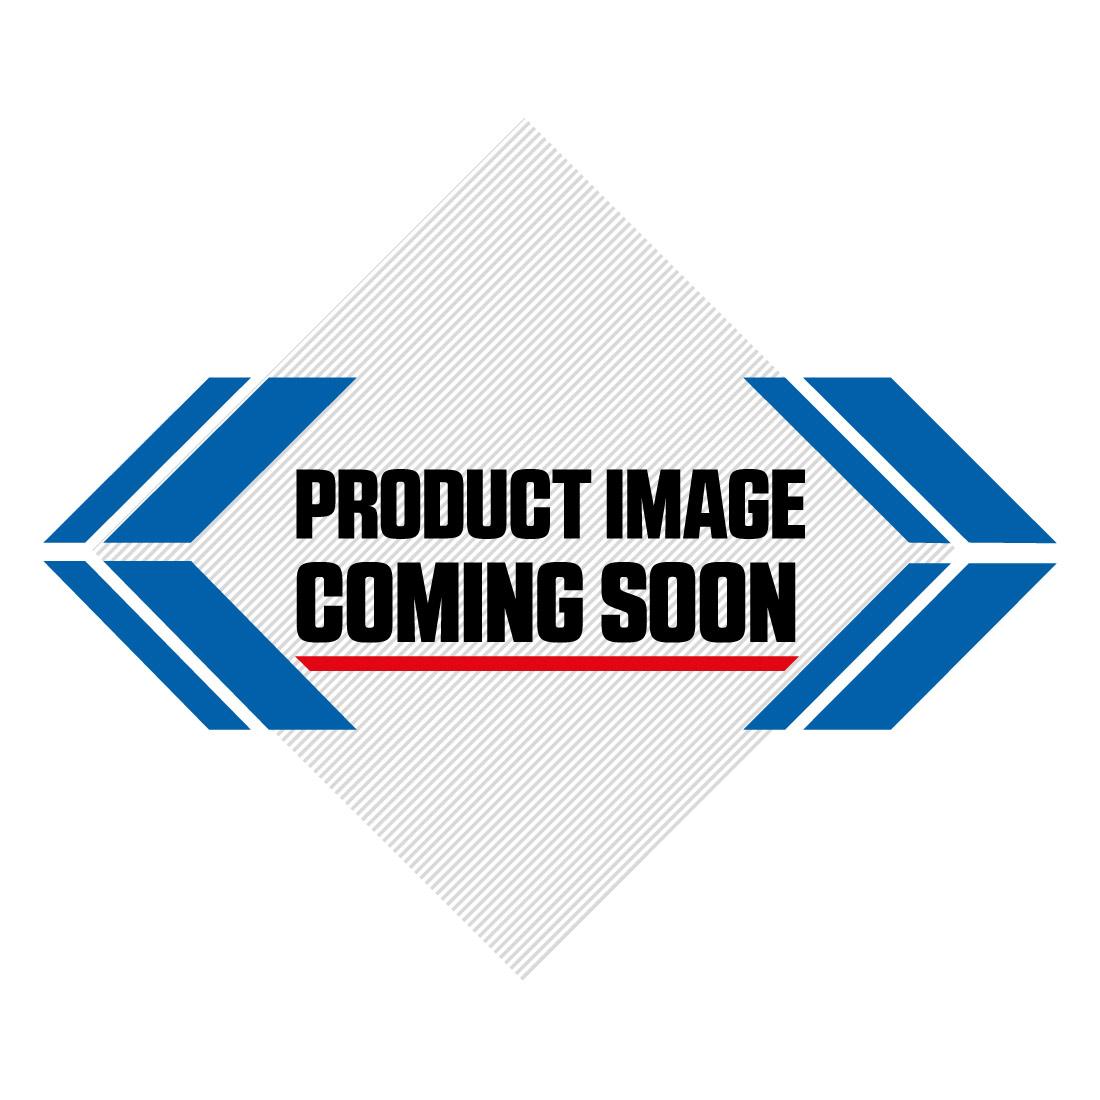 DJI Mavic 2 Pro Drone Image-6